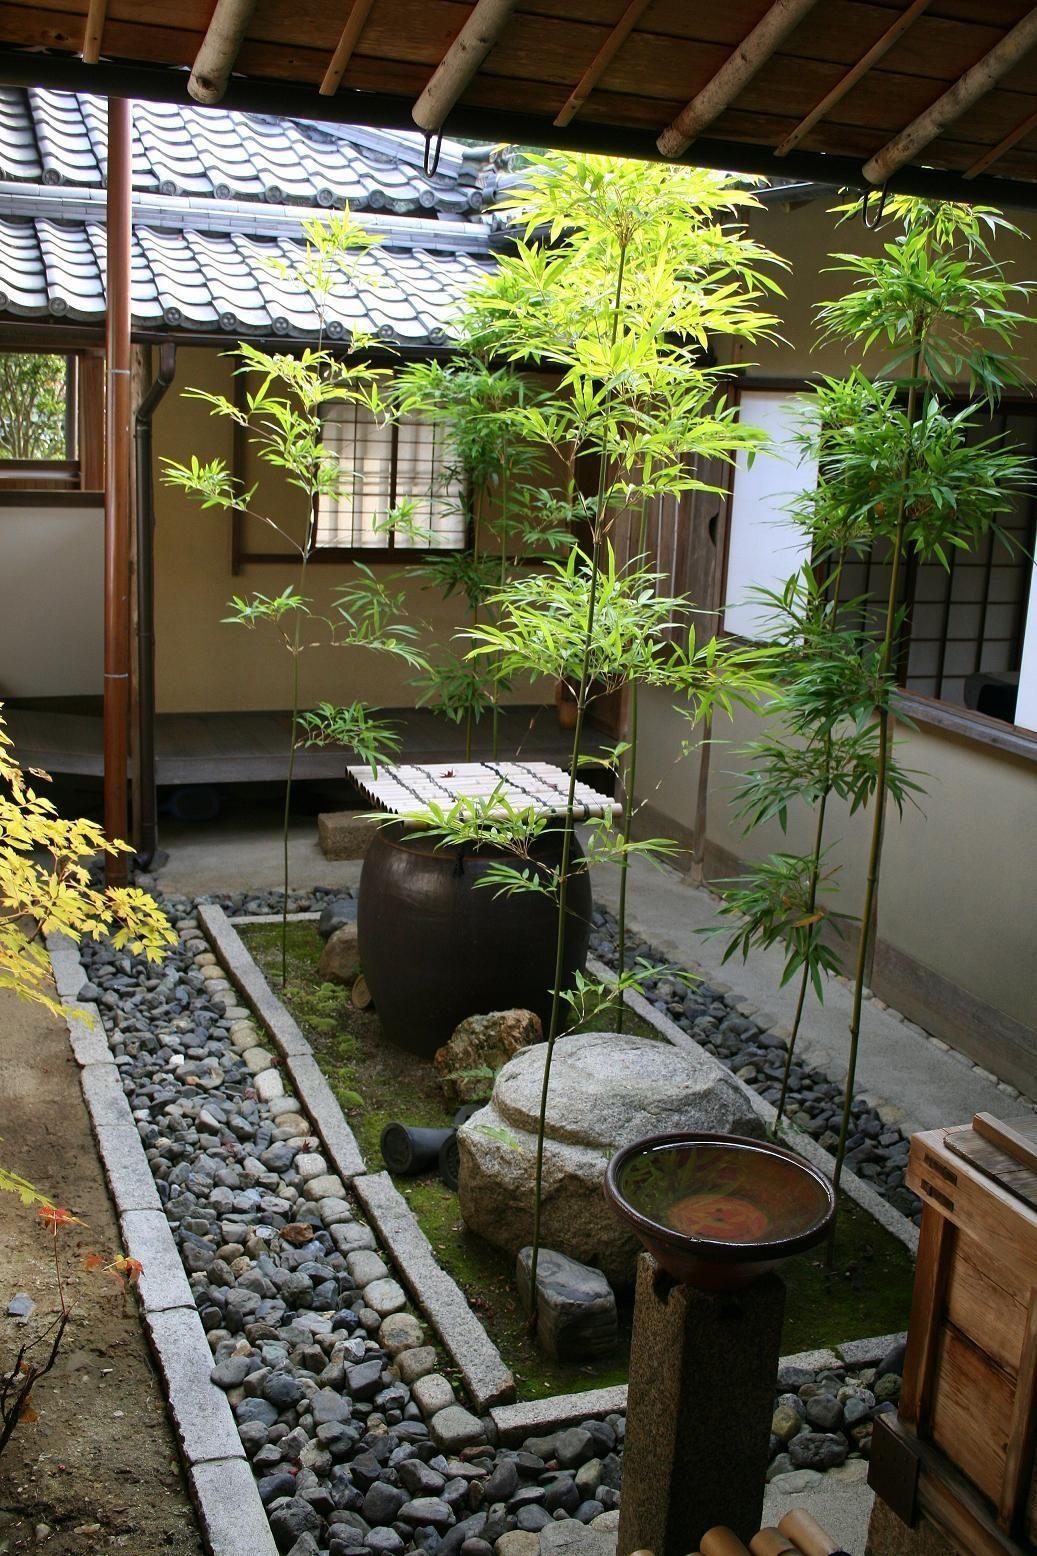 Pin by Inman Zen on 庭:庭院   Pinterest   Gardens, Outdoor spaces ...